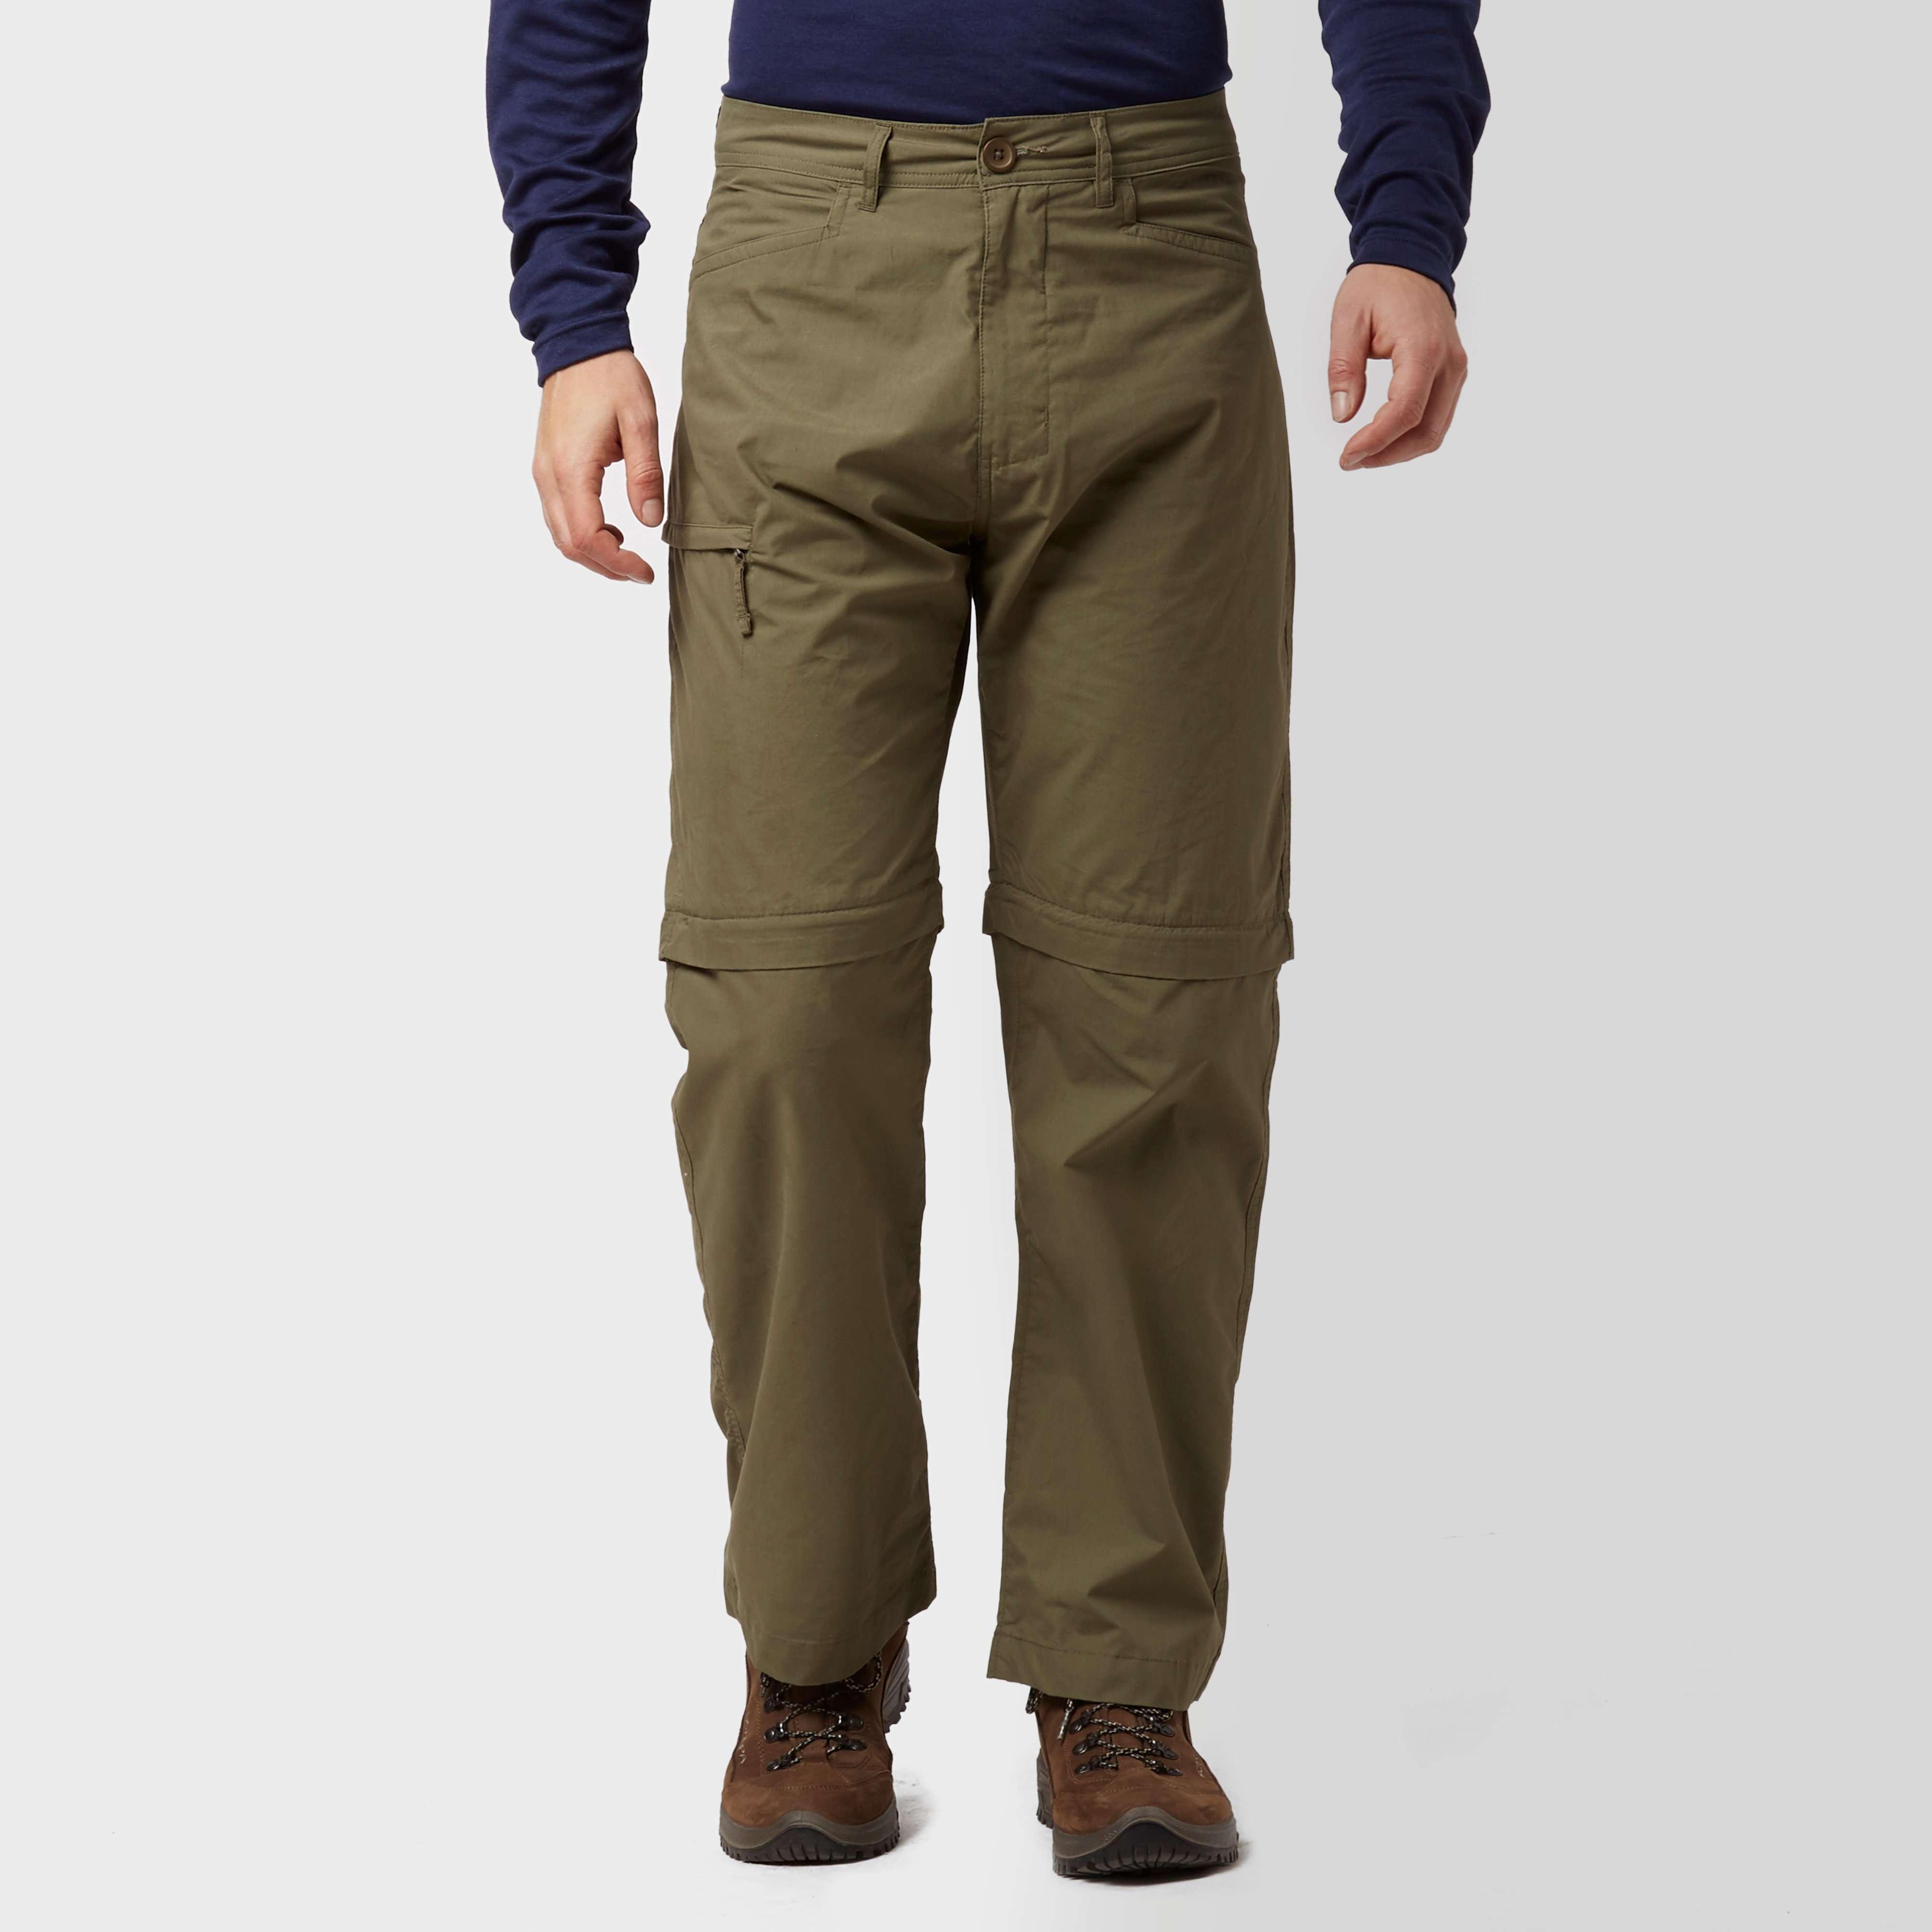 PETER STORM Men's Ramble Convertible Trousers (Short)